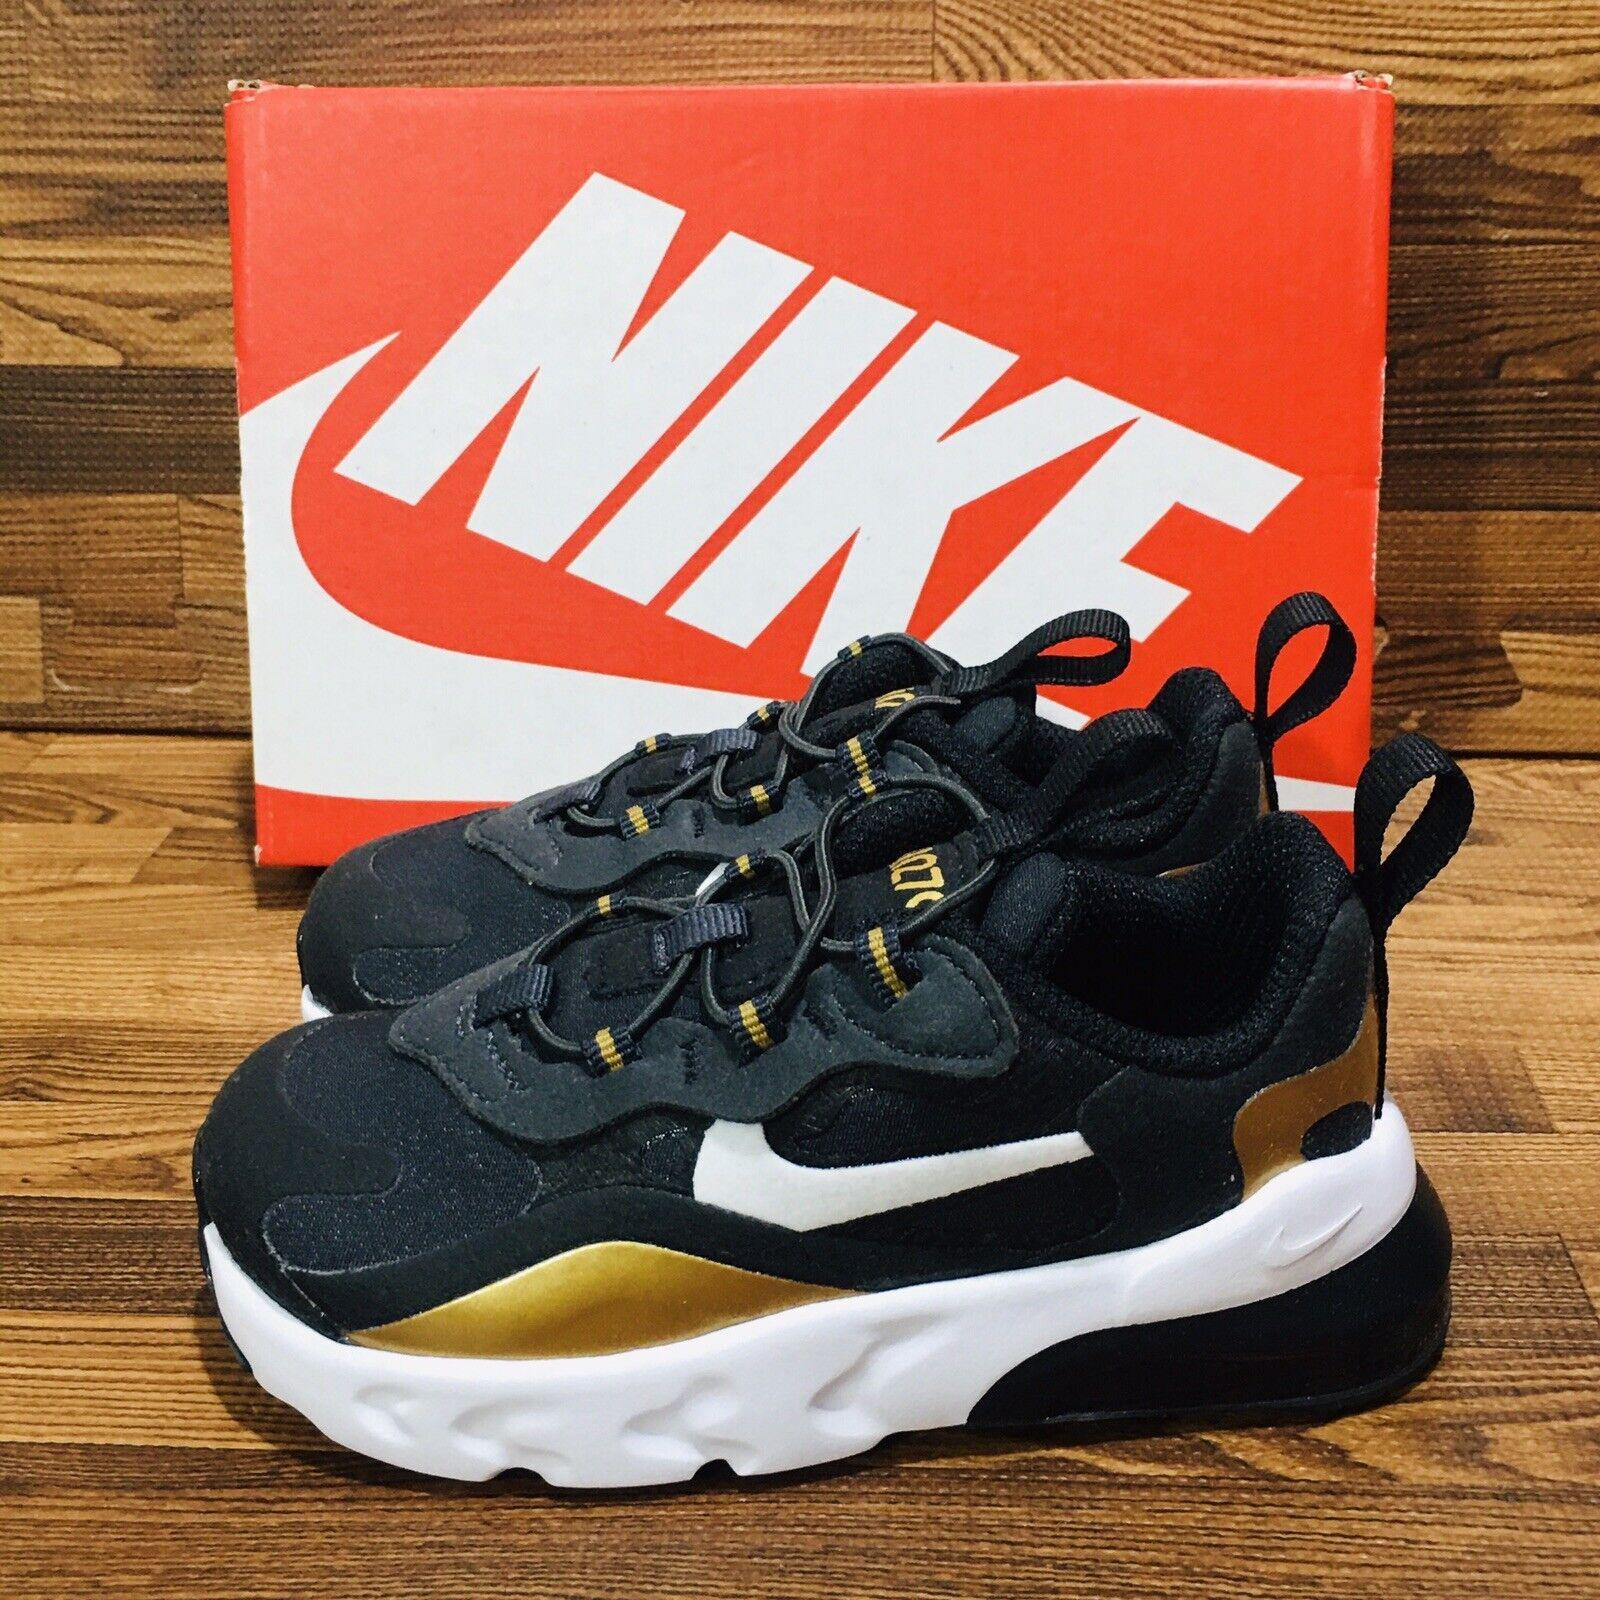 Nike Air Foamposites Lil Posite Size 5c